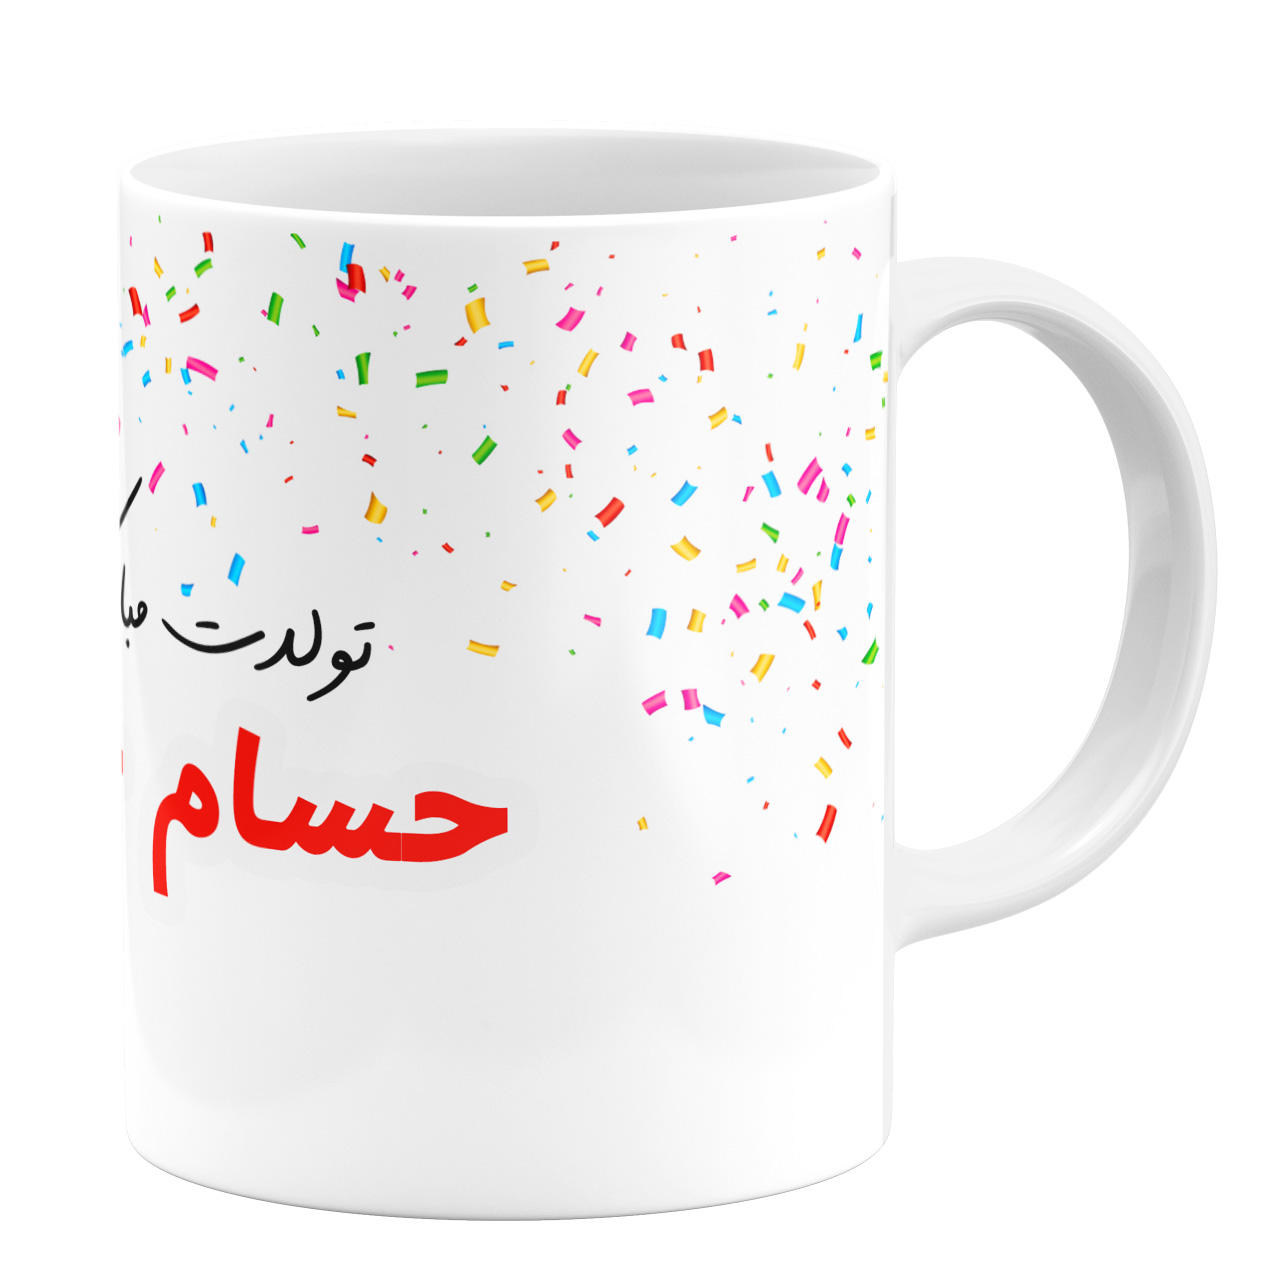 عکس ماگ طرح تولد حسام کد 11054093948